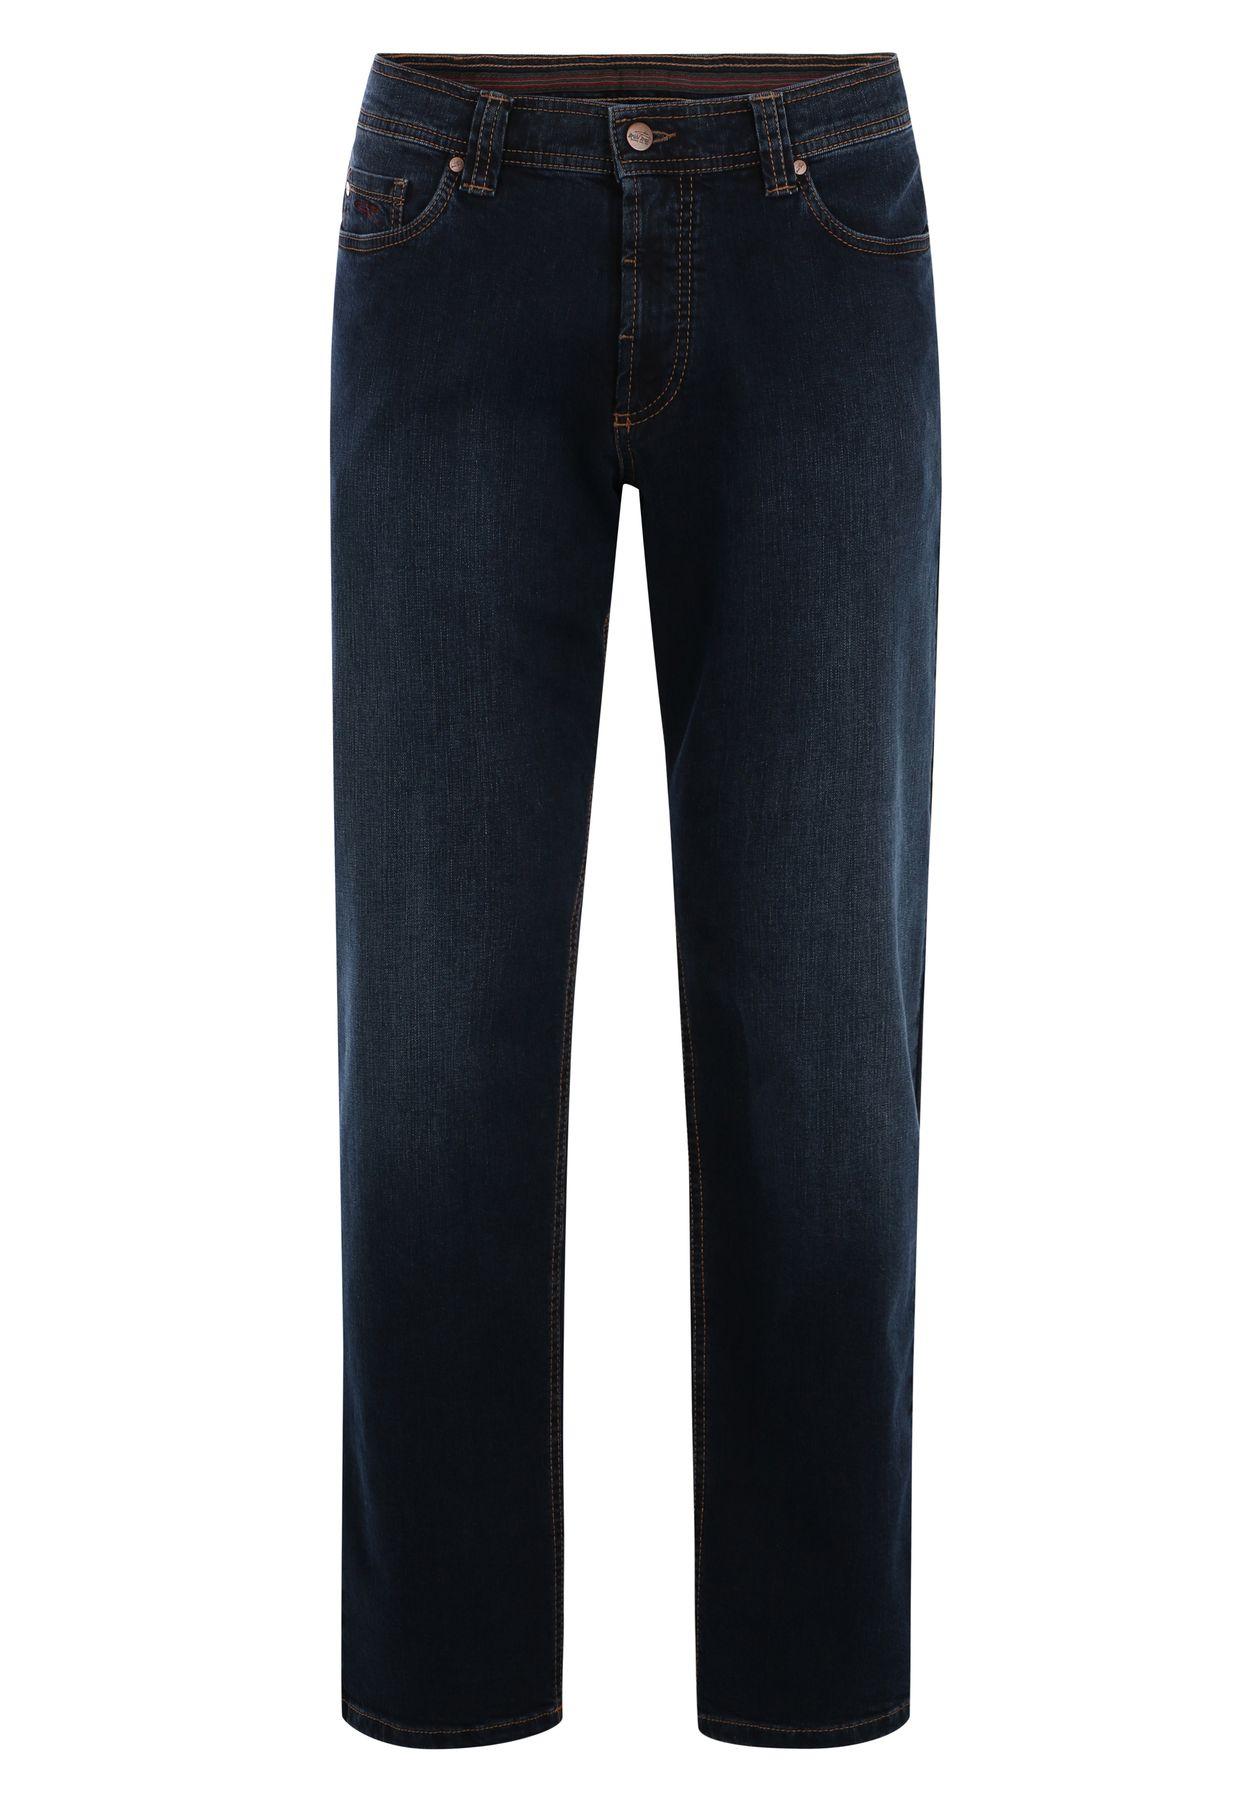 Brühl - Herren 5-Pocket Jeans in verschiedenen Farben, Toronto (0614190491100) – Bild 3